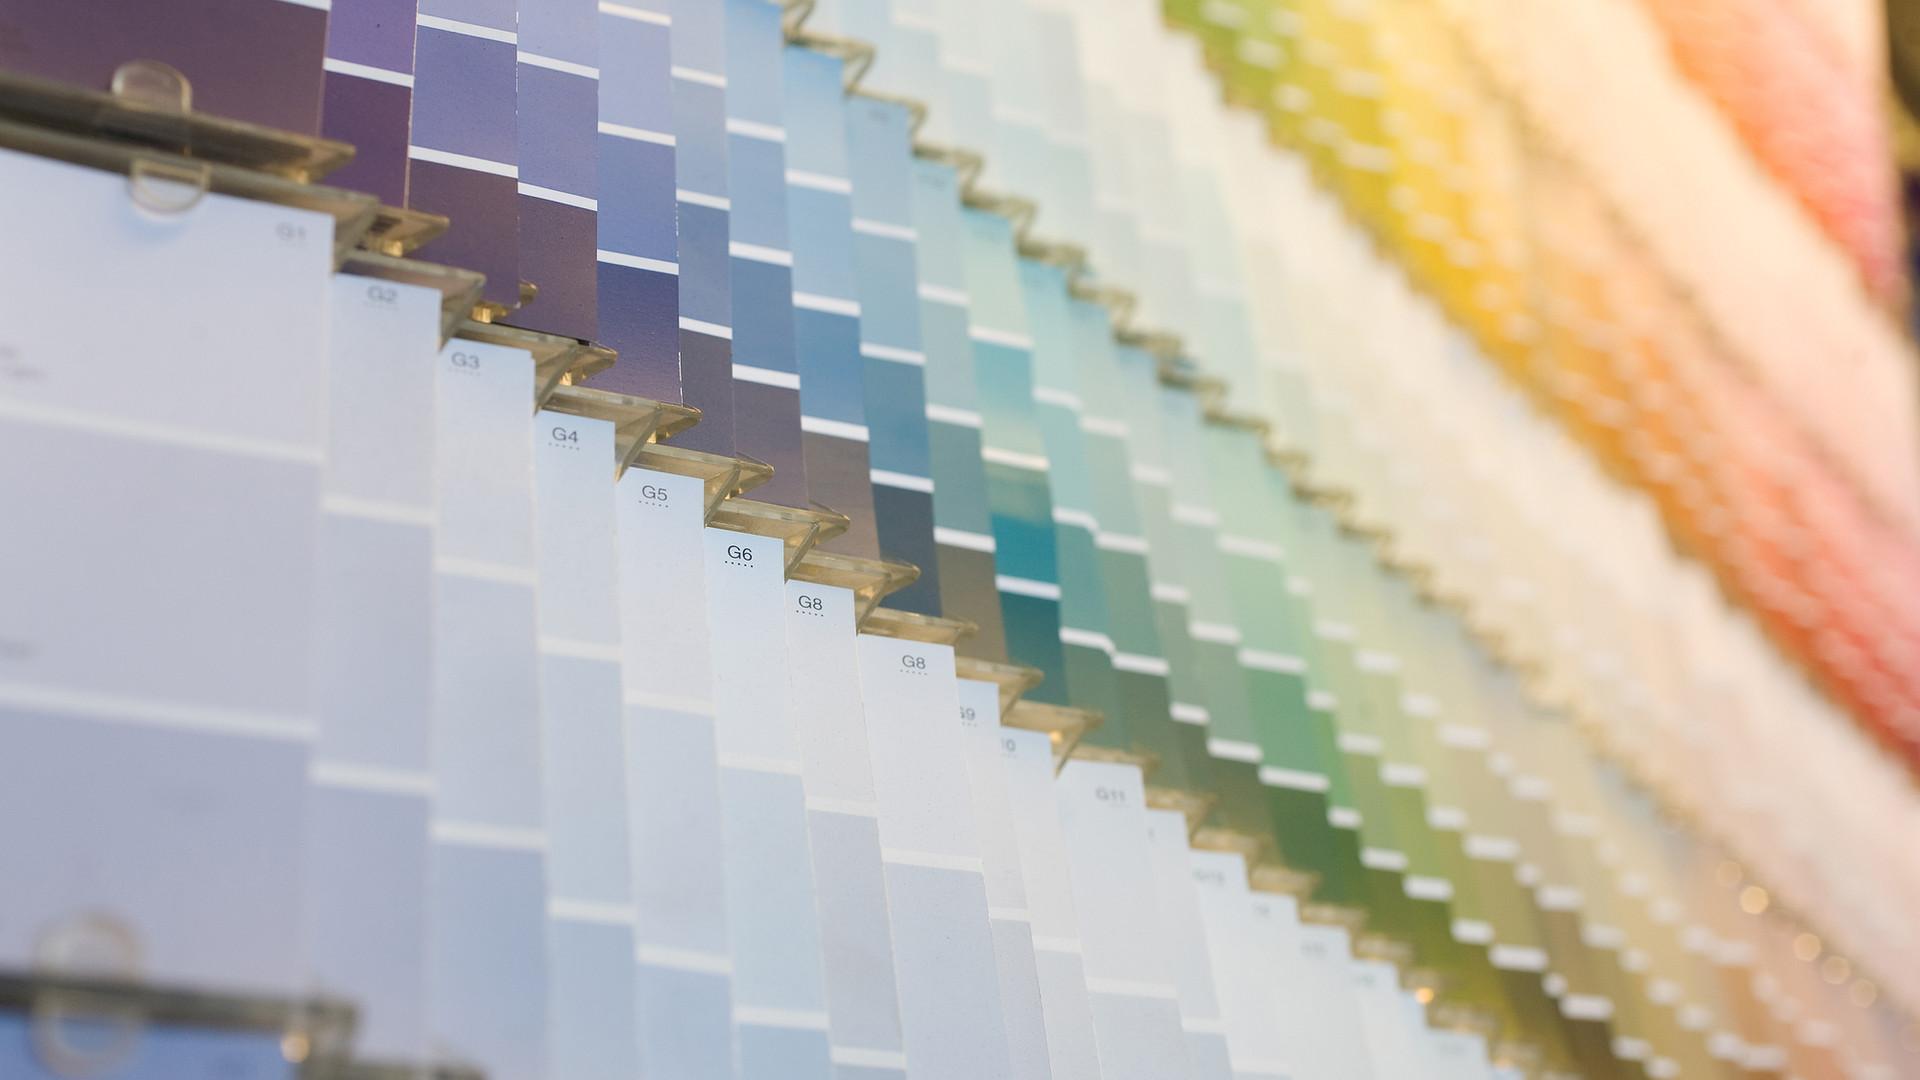 Choosing Paint & Wallpaper